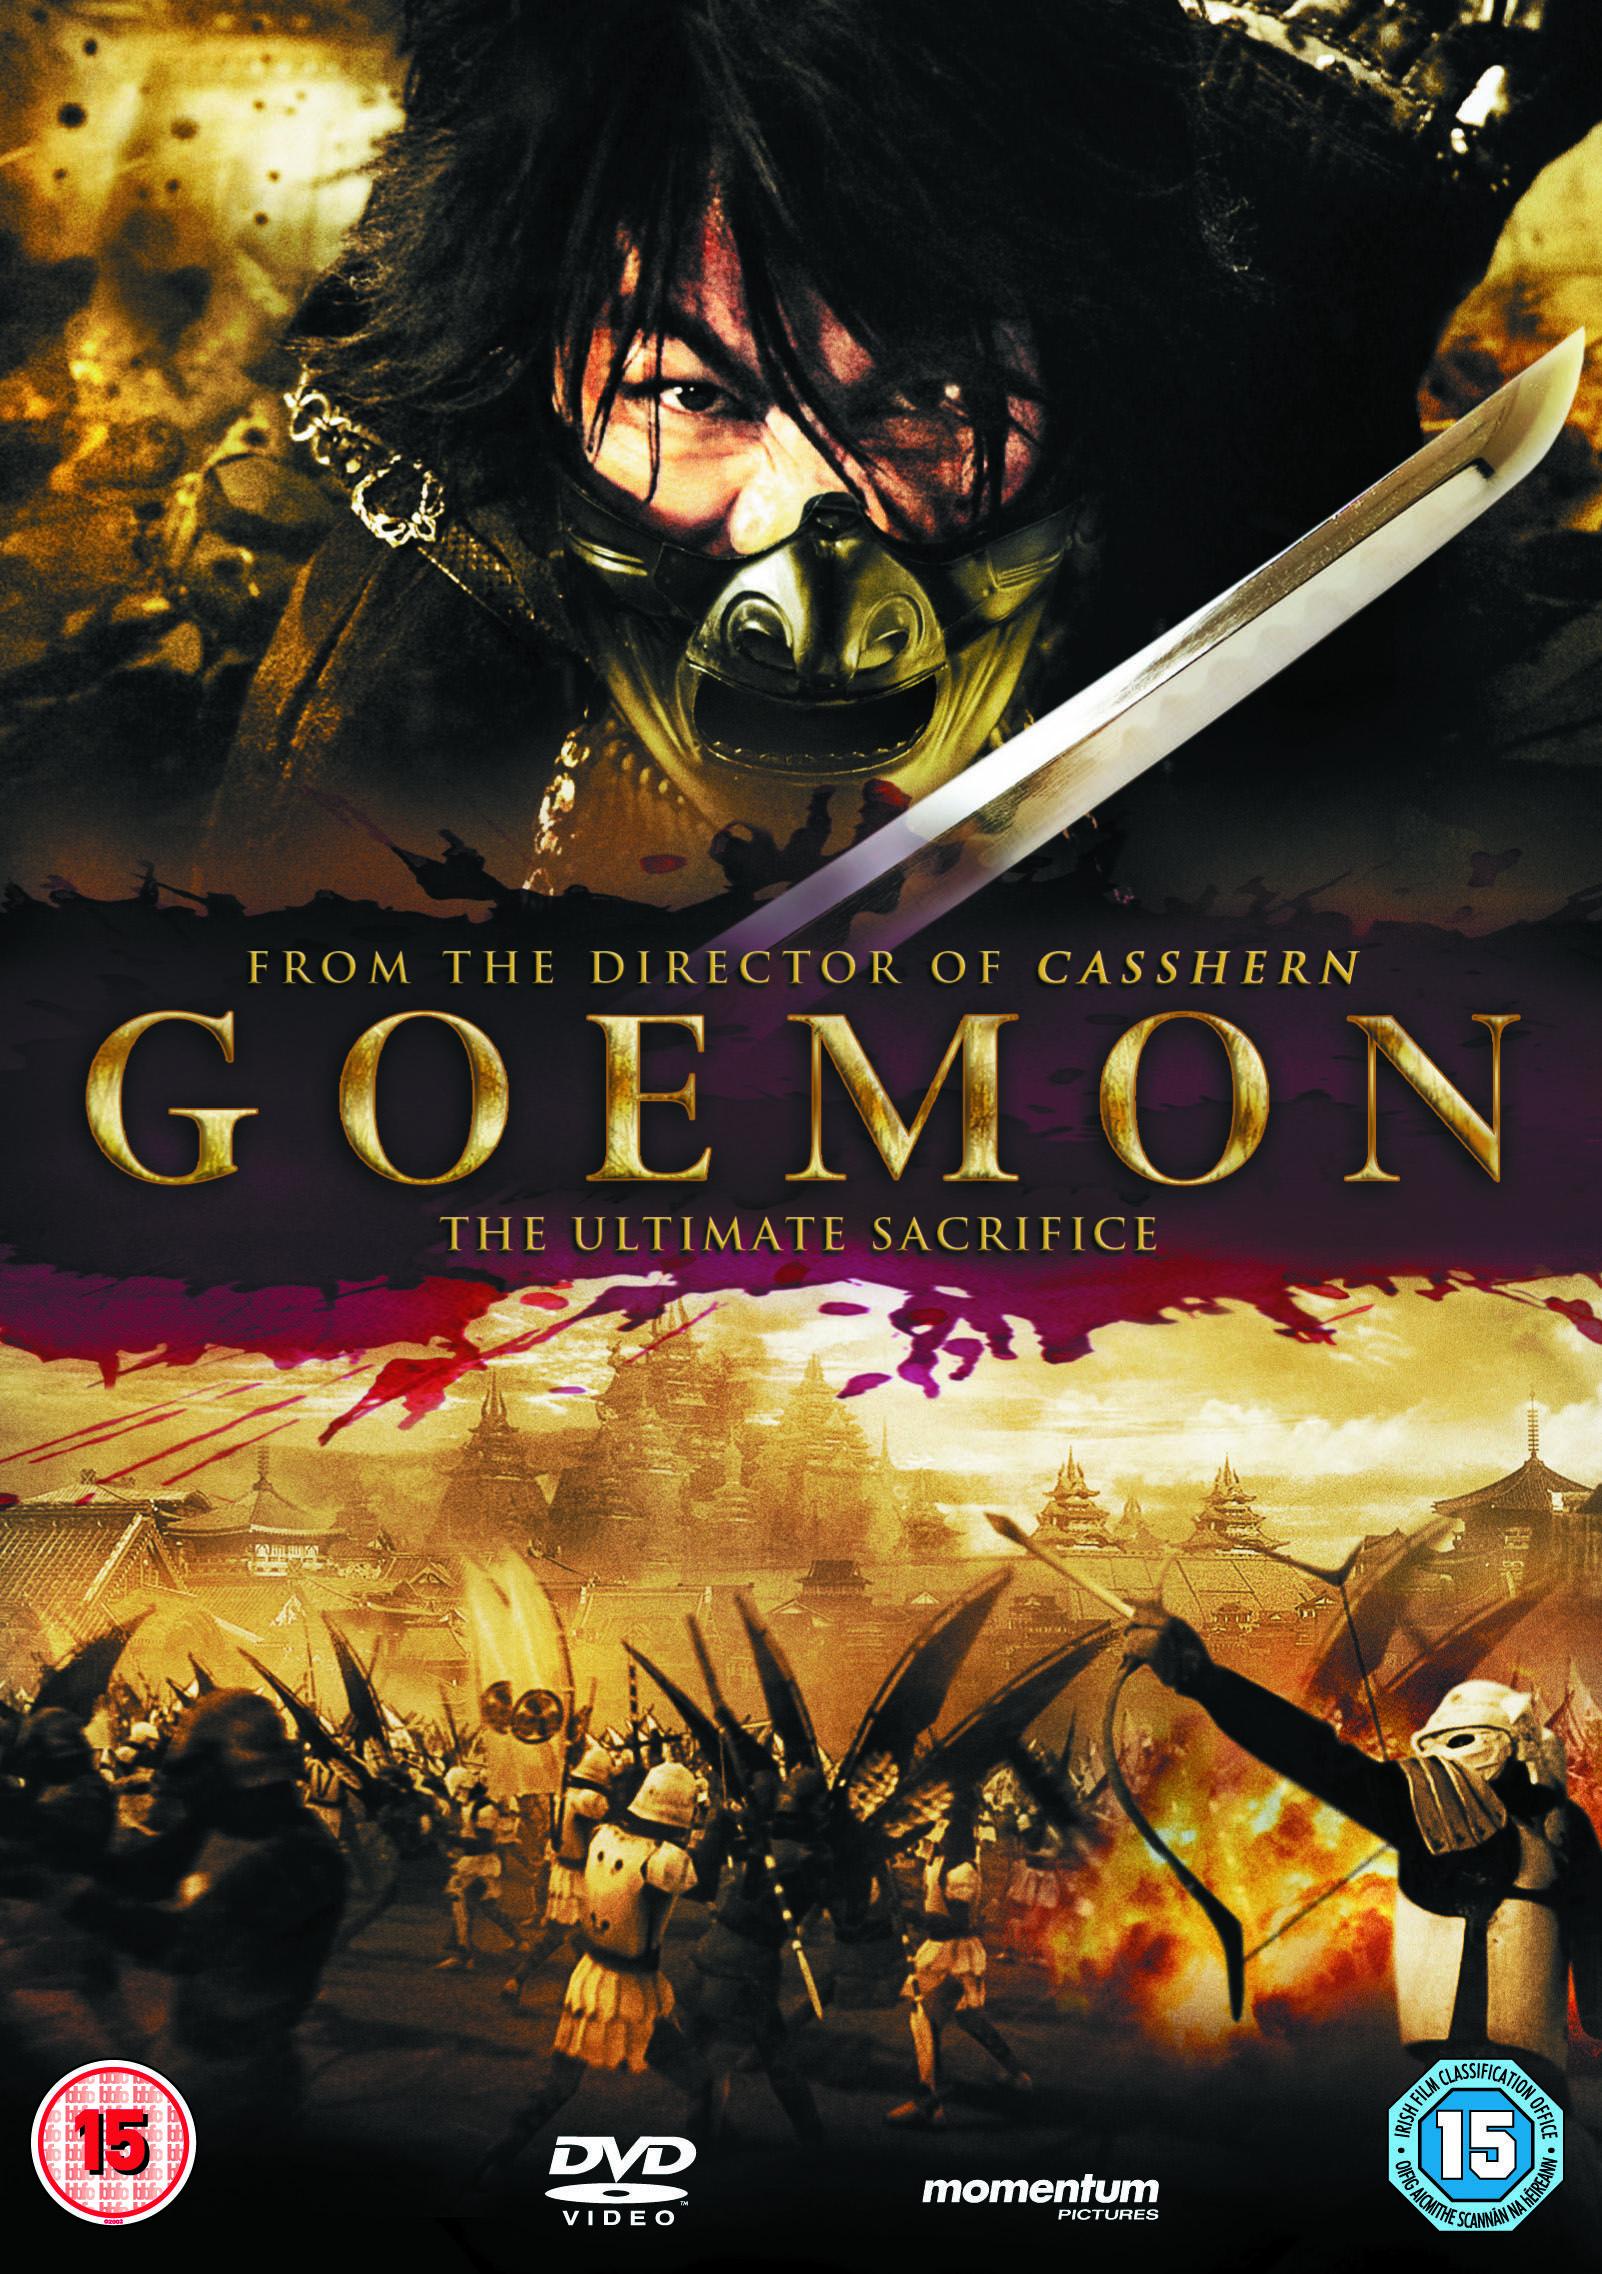 Dvd review goemon english dubbed movies imdb movies